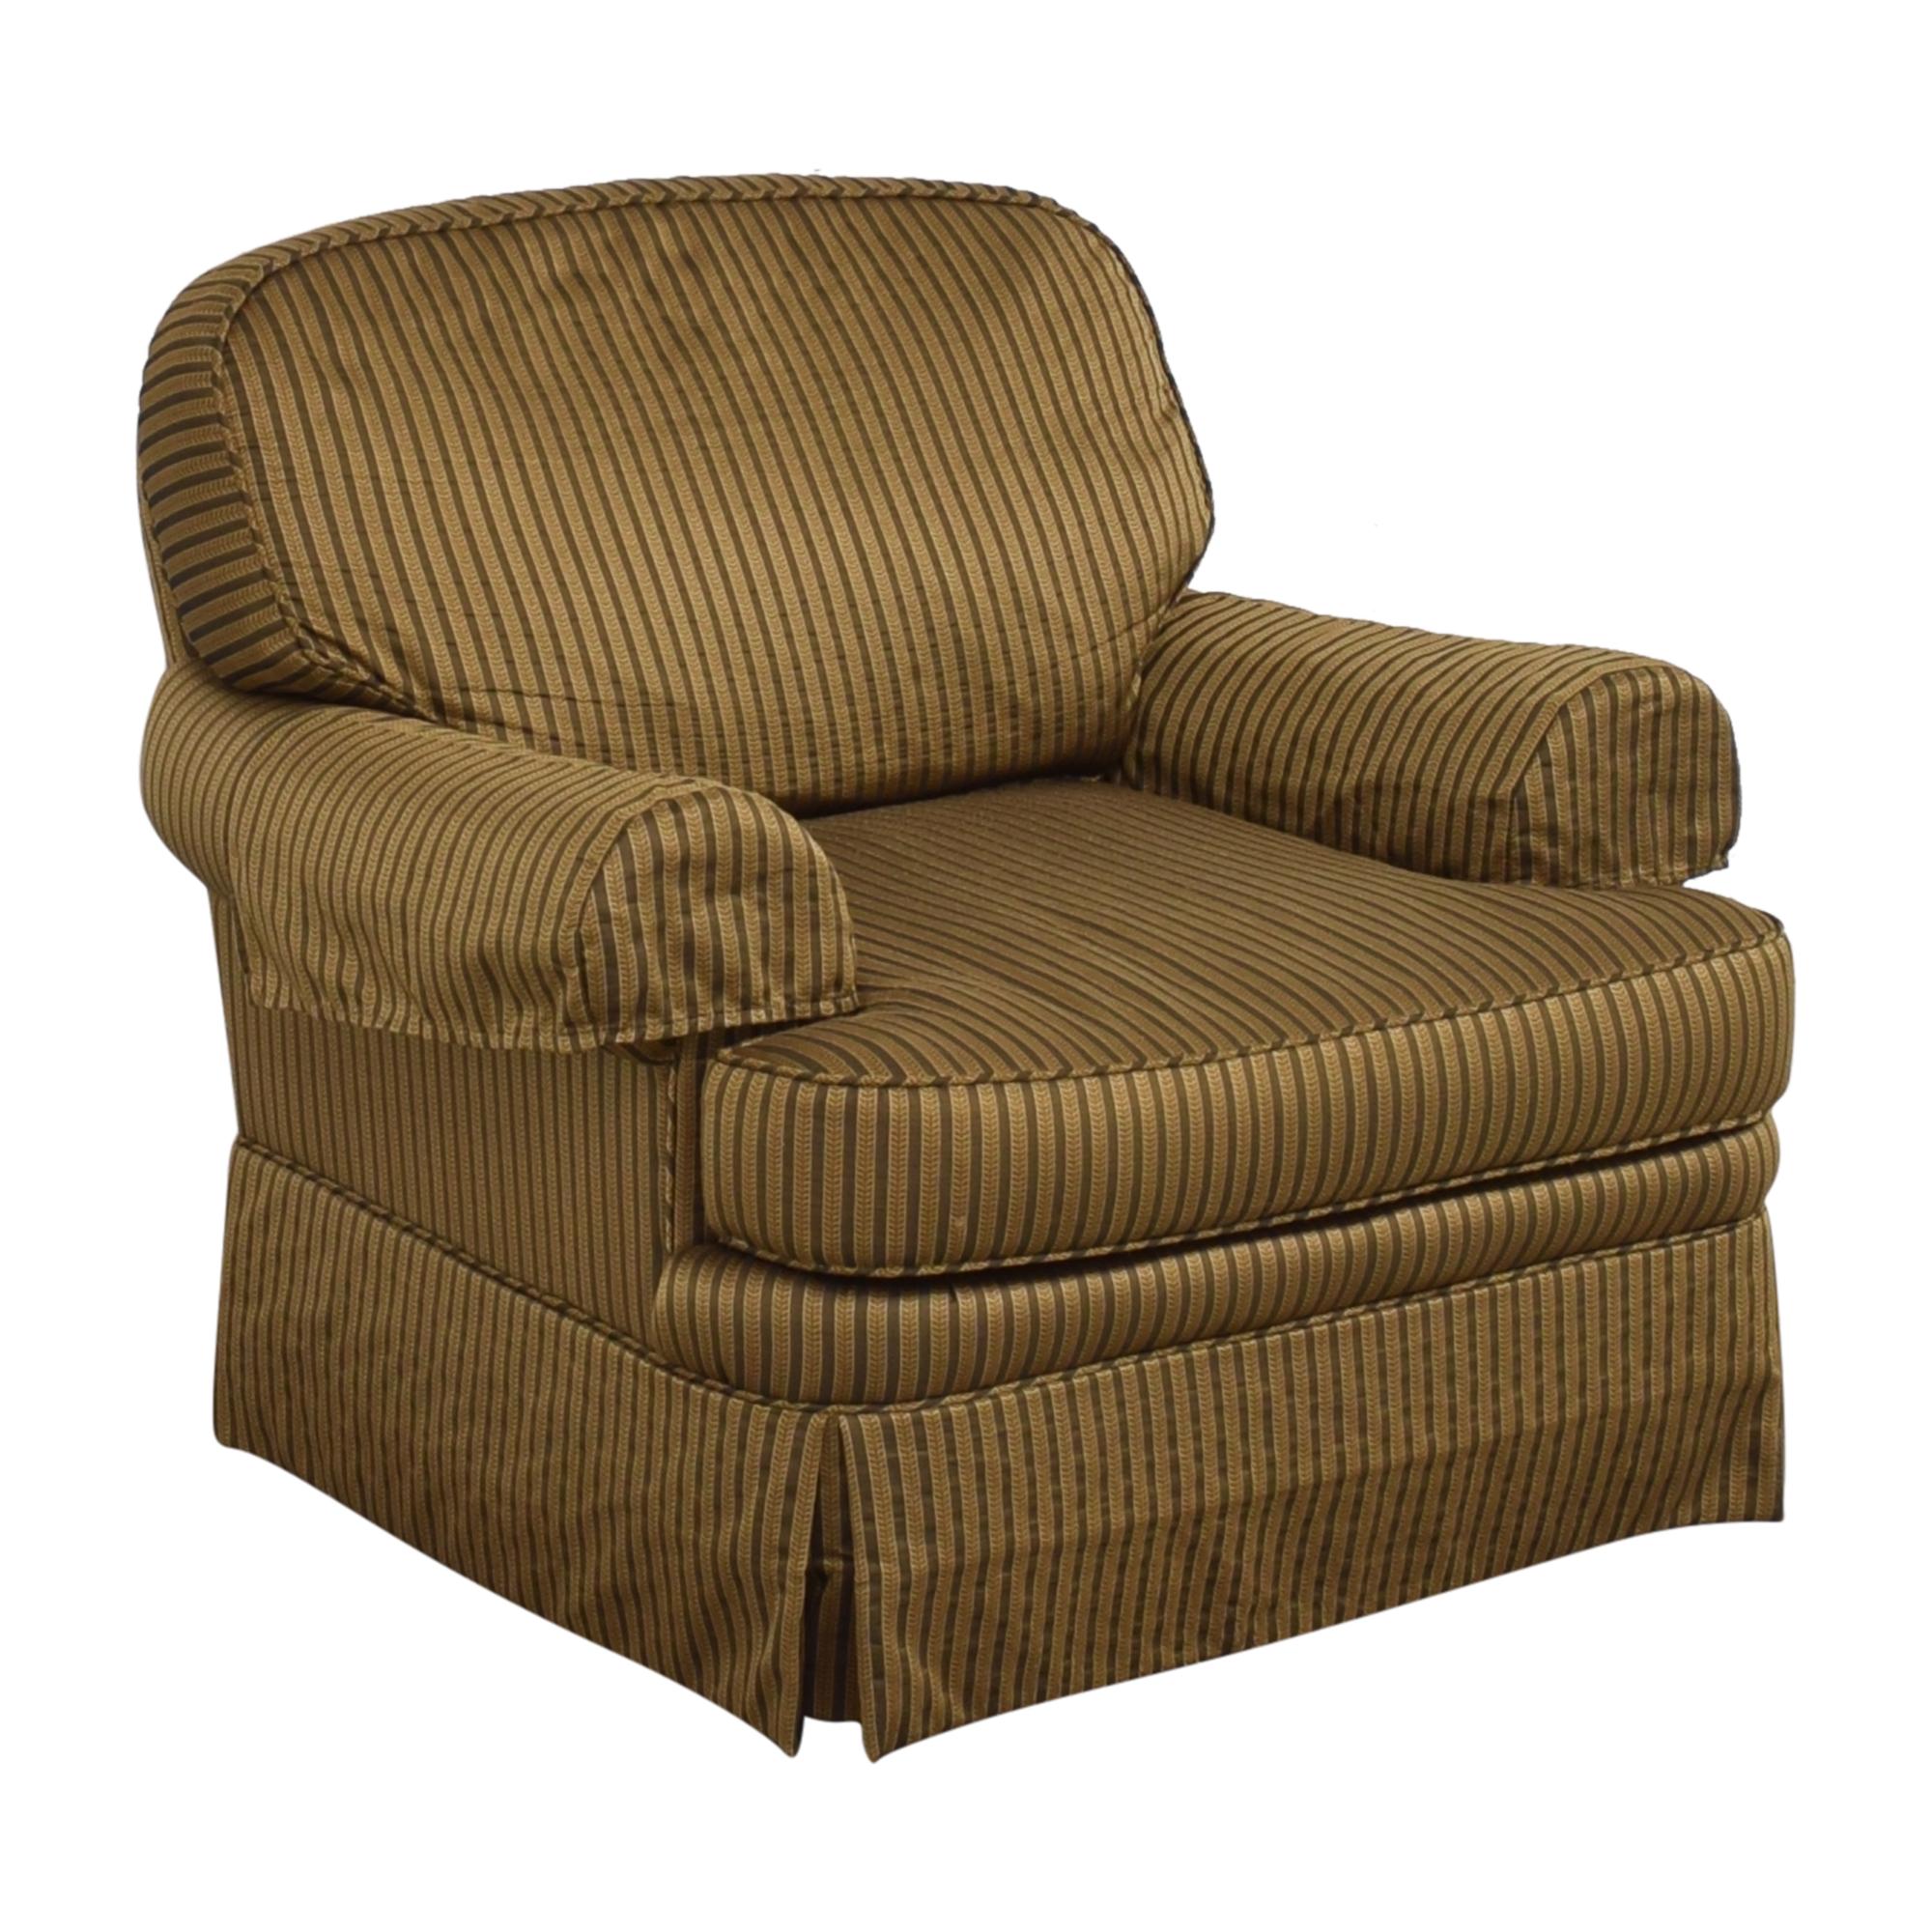 Woodmark Woodmark Swivel Chair for sale